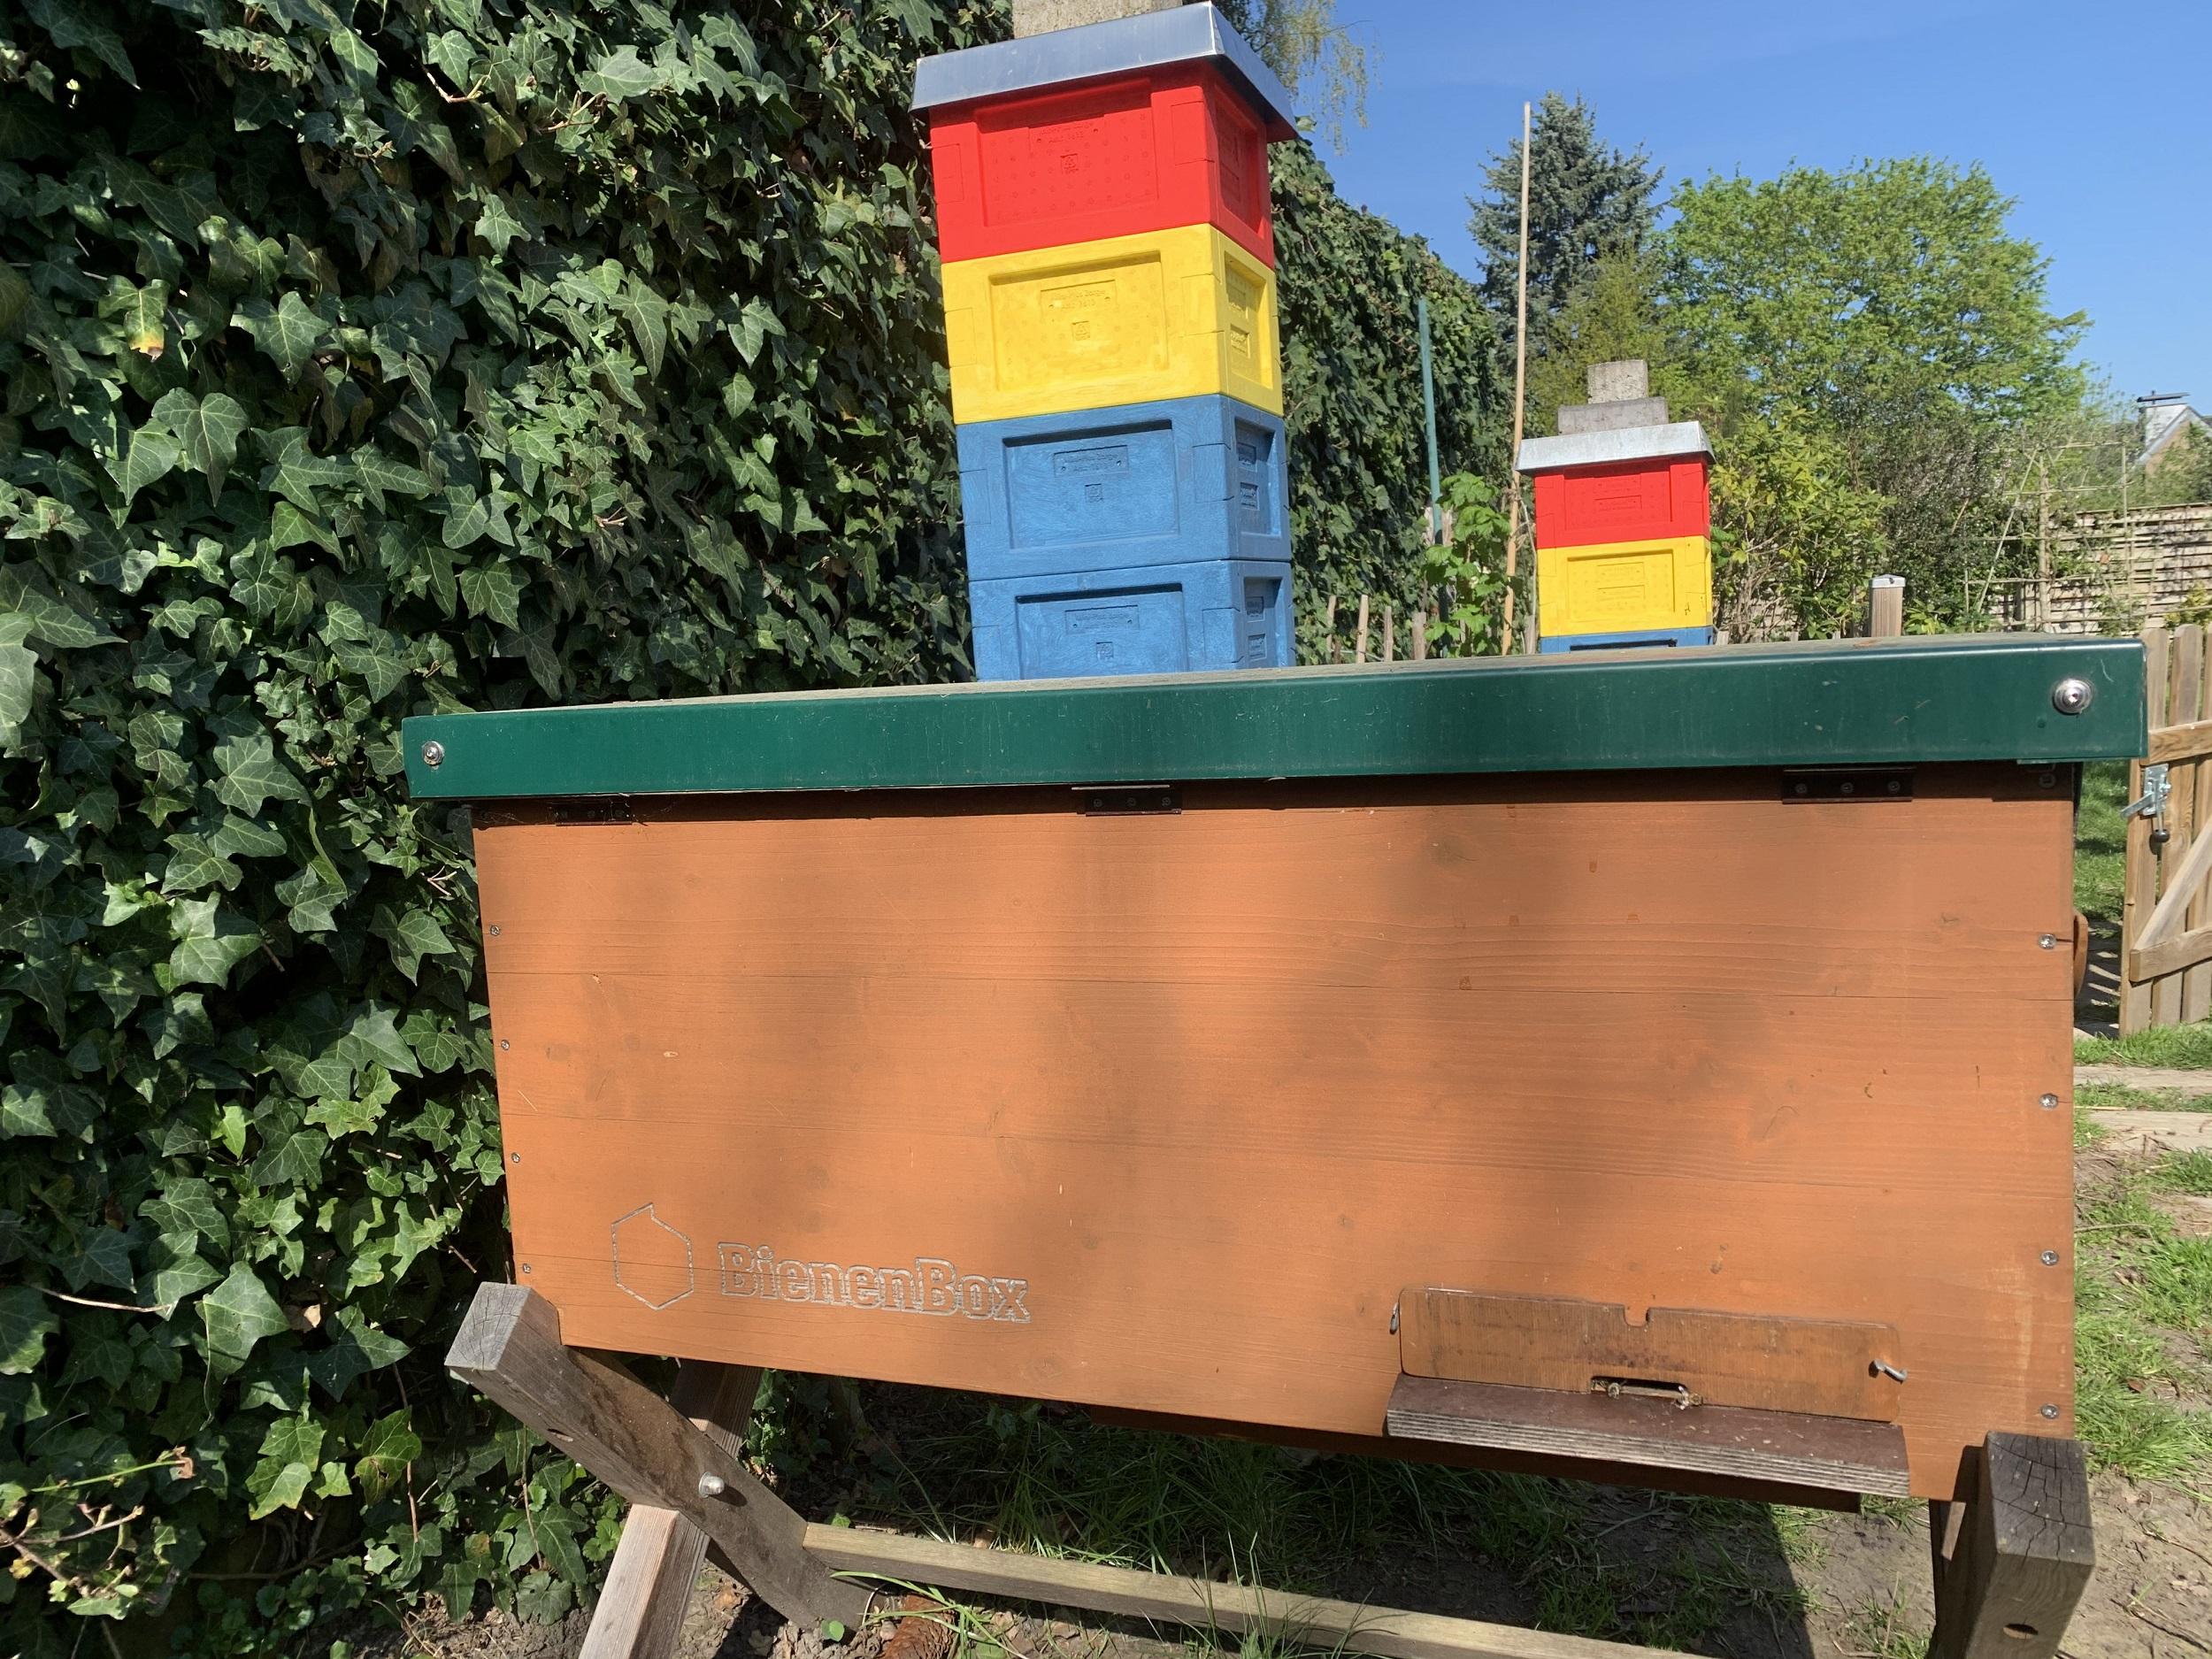 Bienenbox Volk 6 Bild April 2020